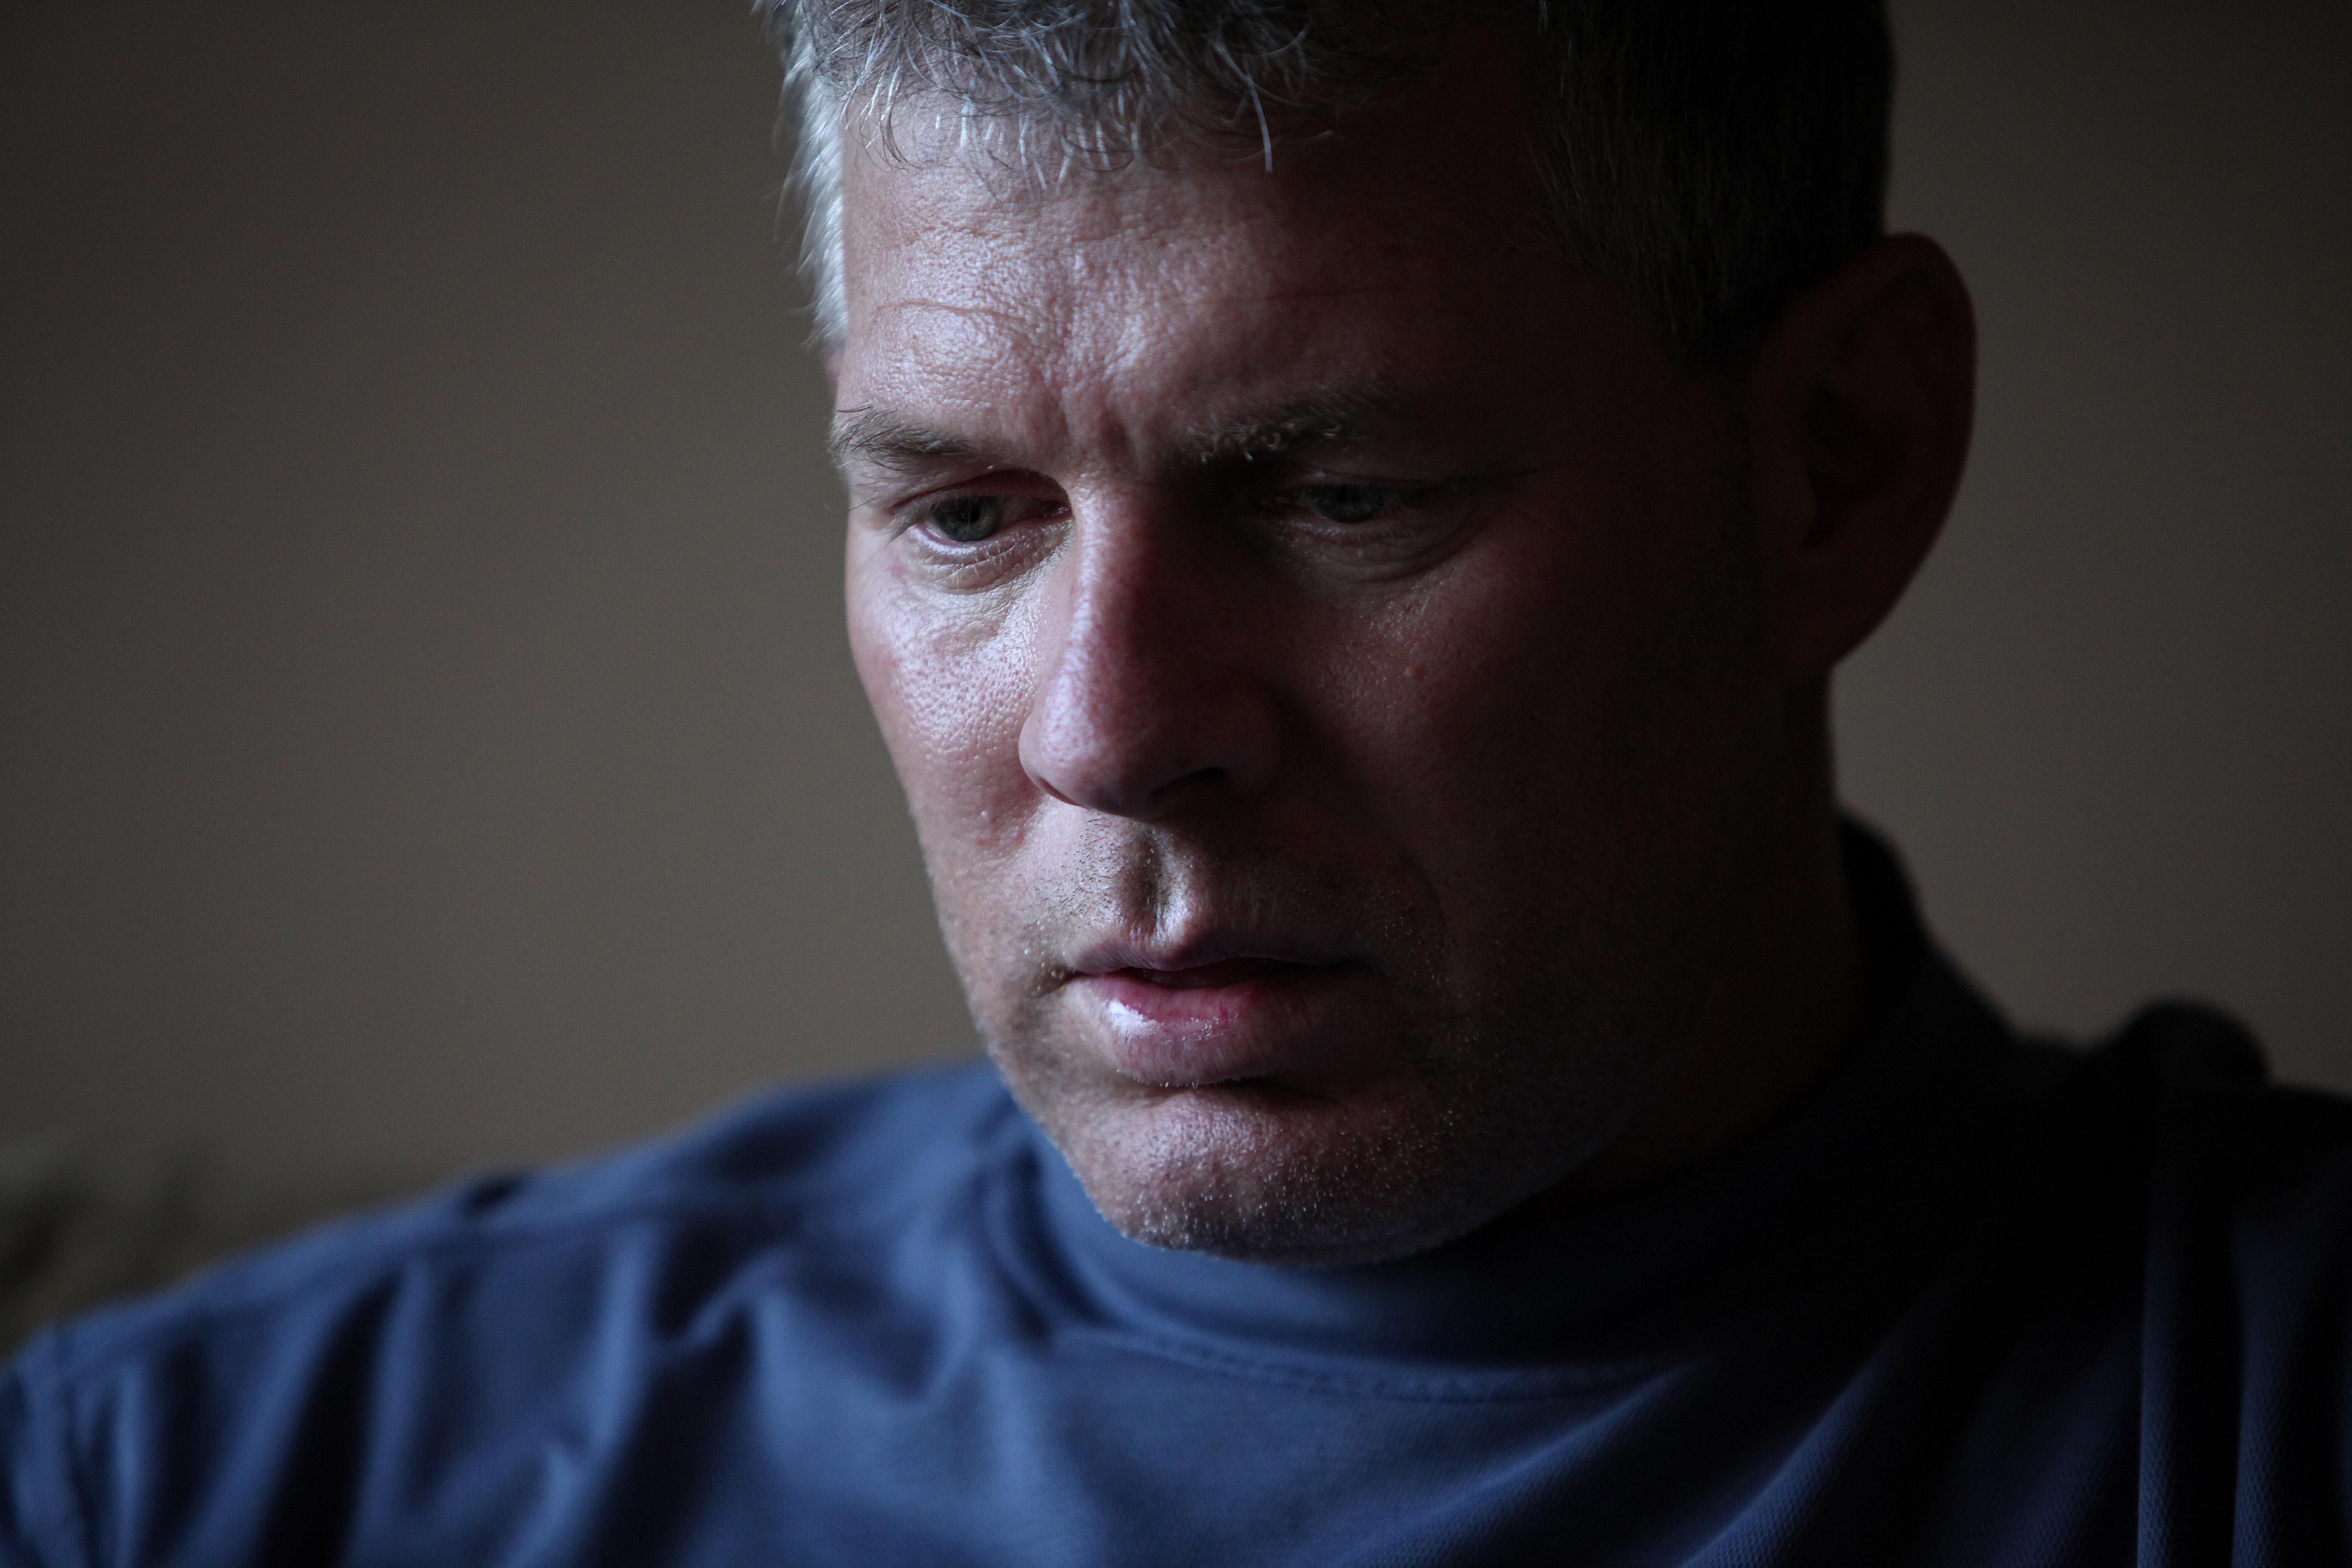 Lenny Dykstra, in 2007